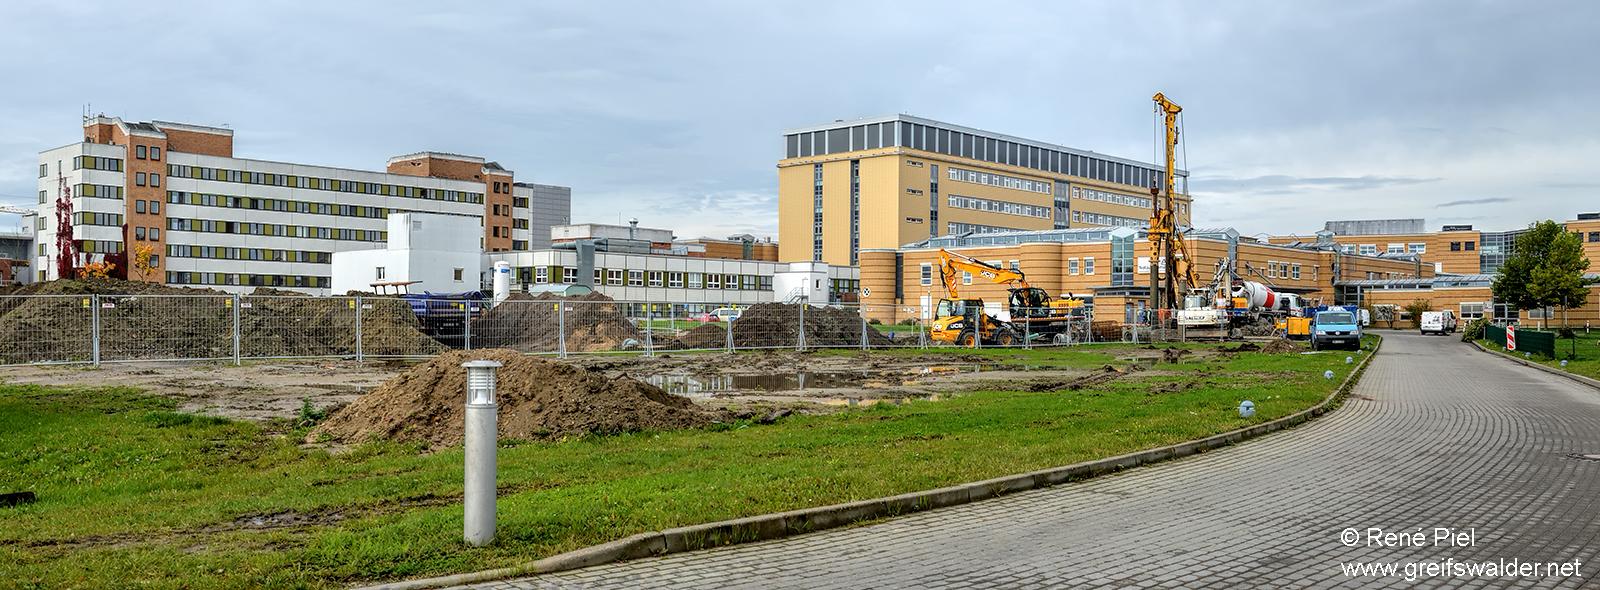 Baustelle am Klinikum in Greifswald